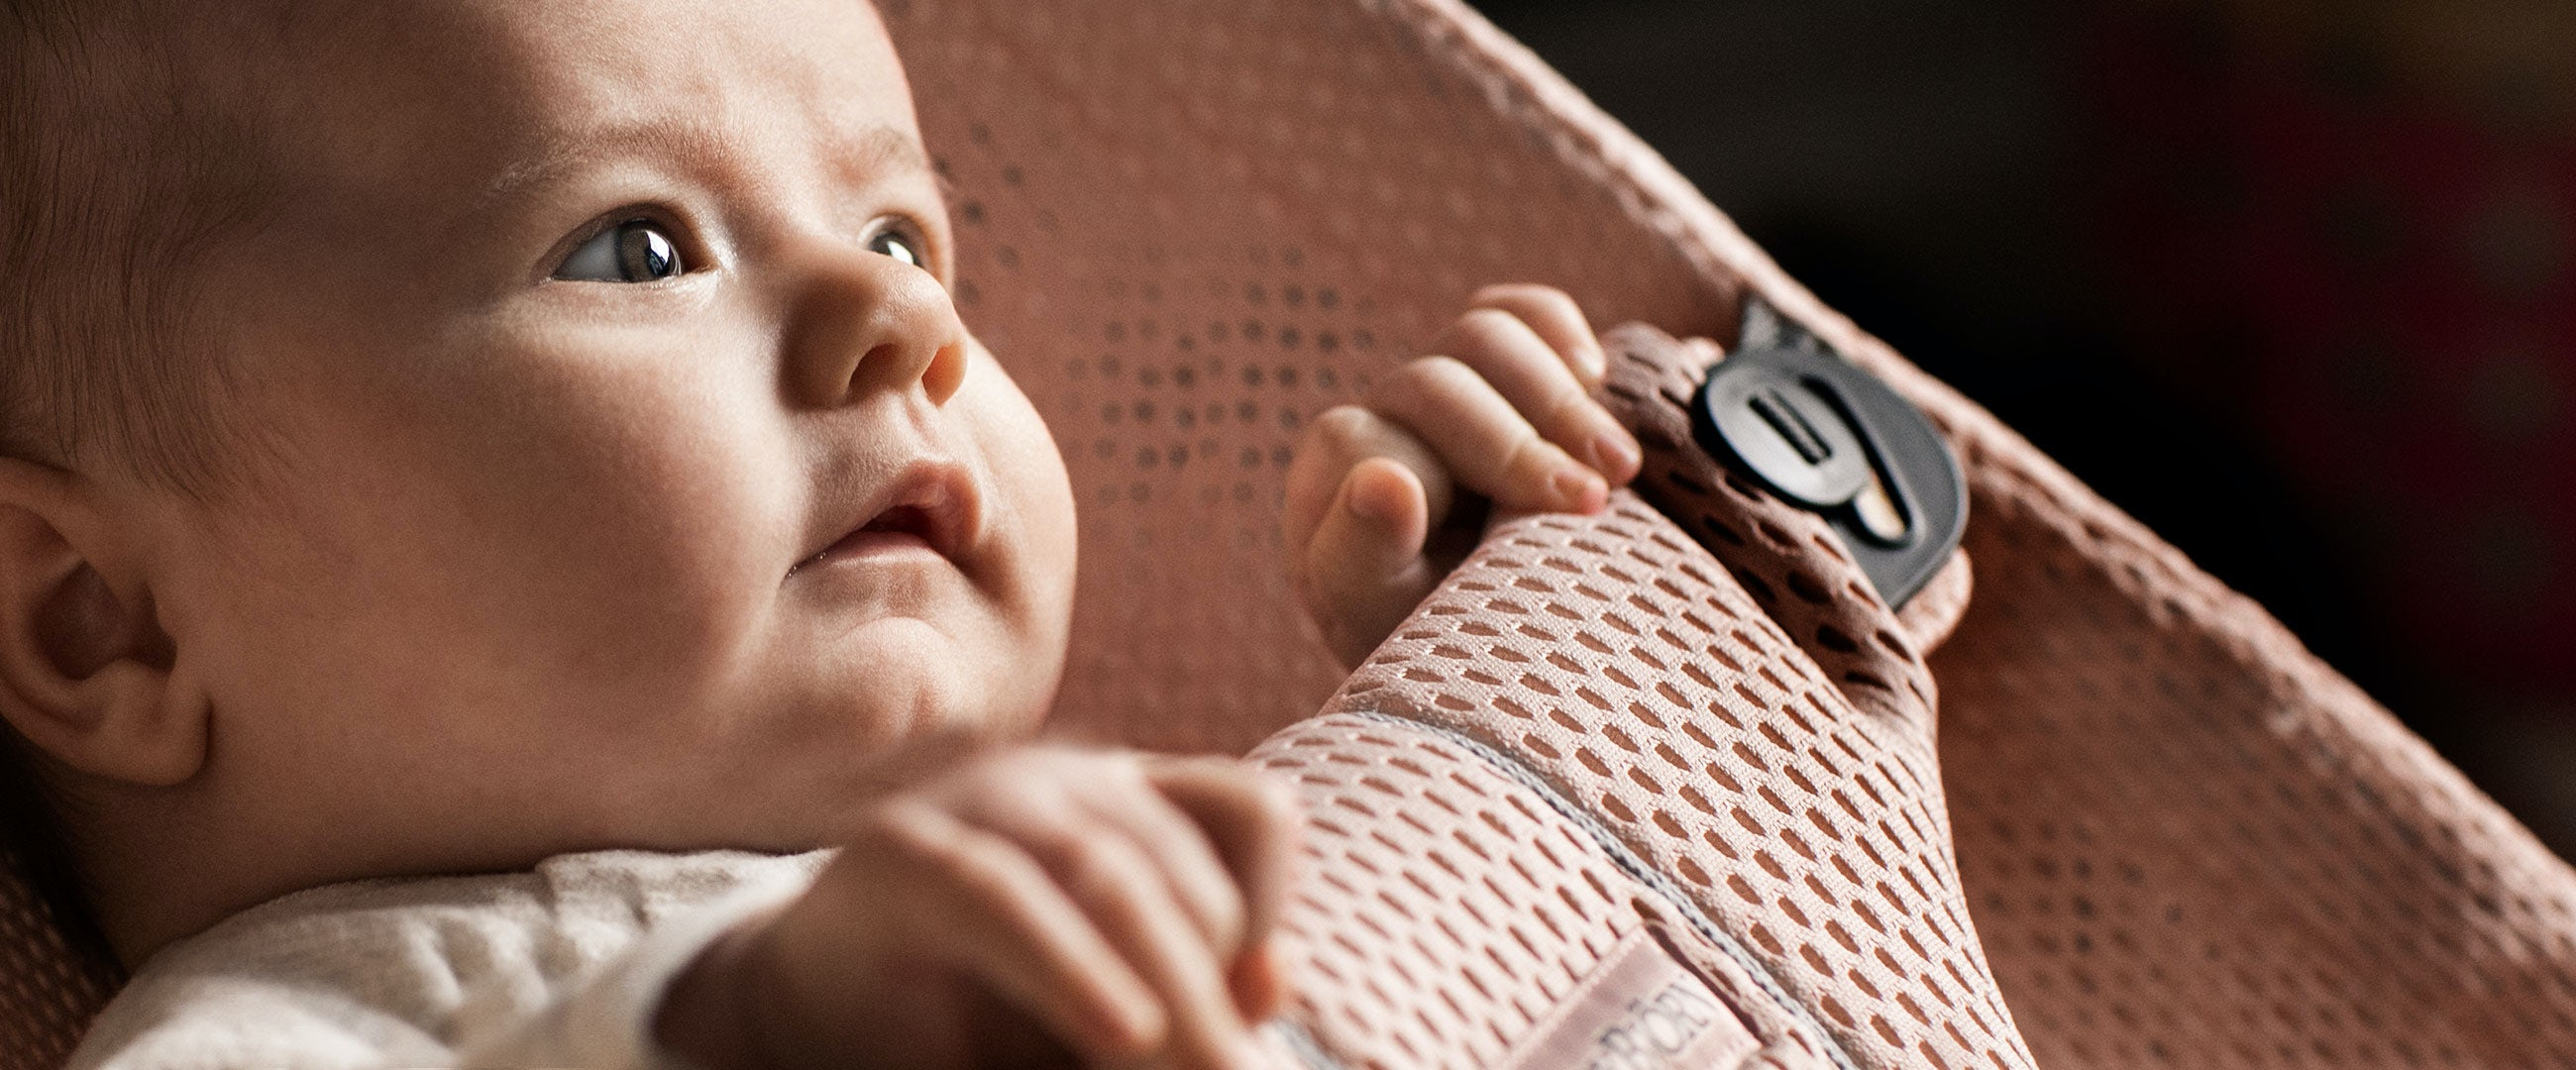 ee61a7998a2 BABYBJÖRN Shop   Magazine – for happier kids   parents